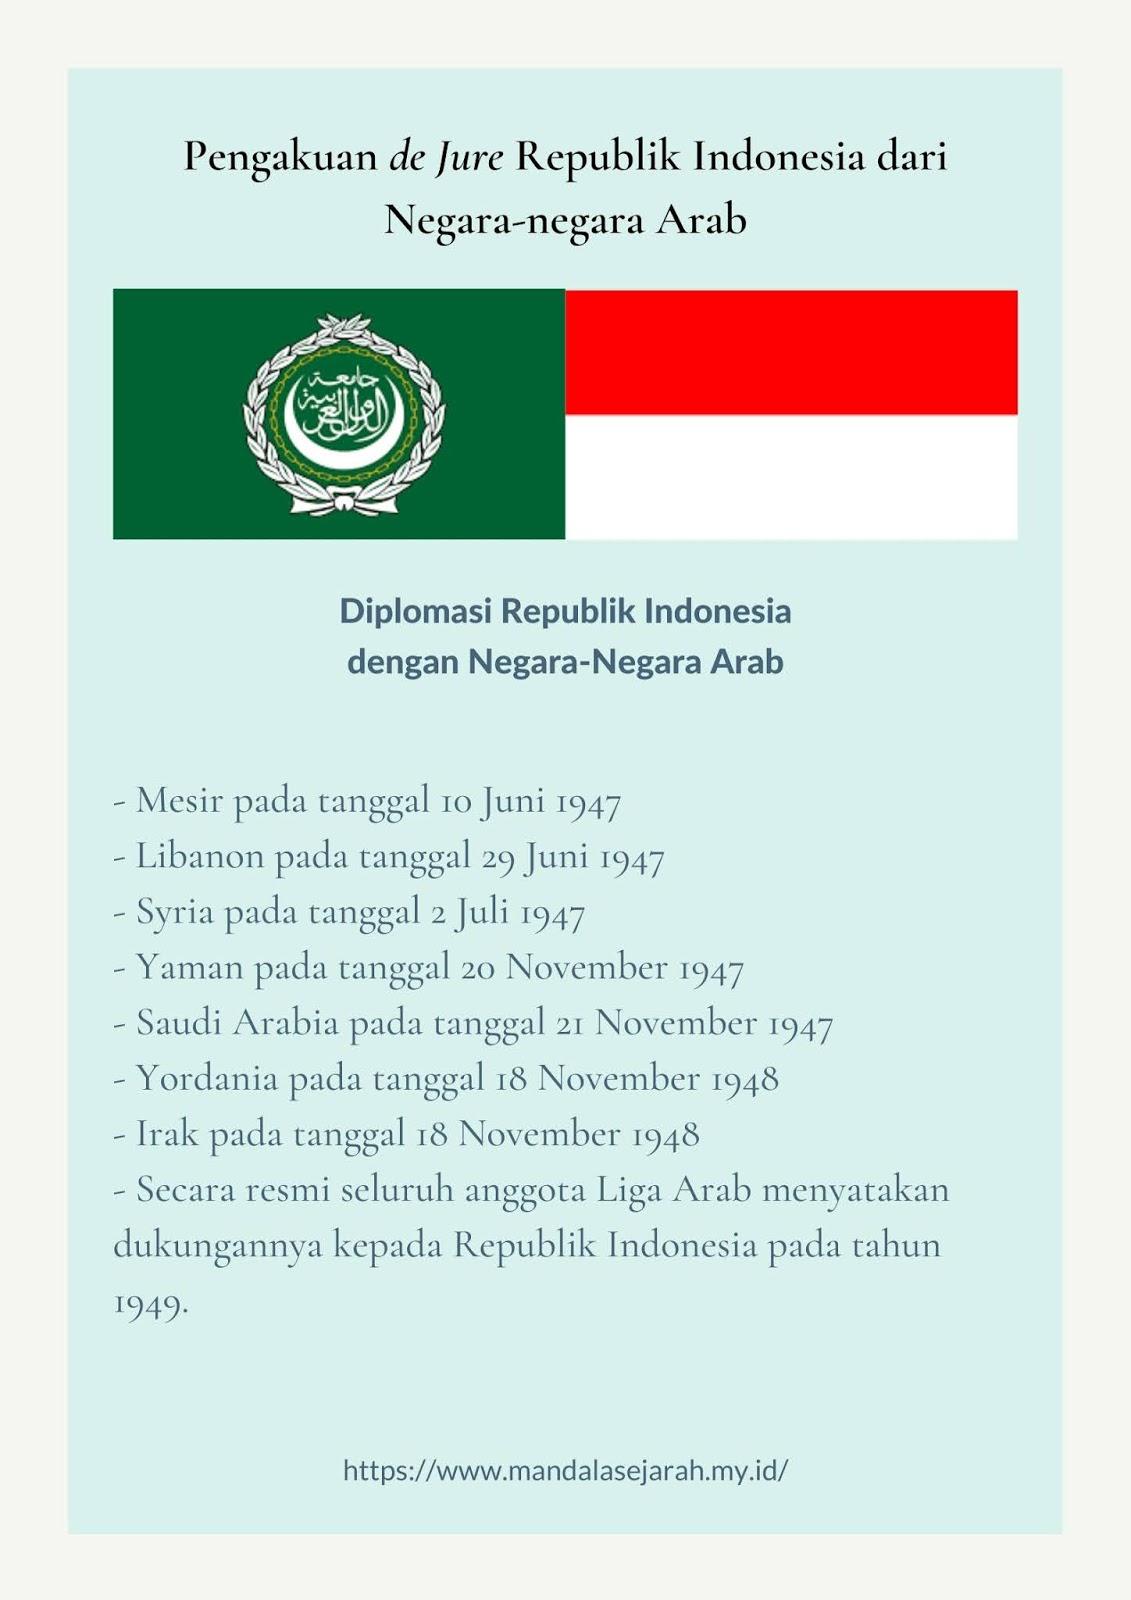 Peran Liga Arab terhadap kemerdekaan Indonesia